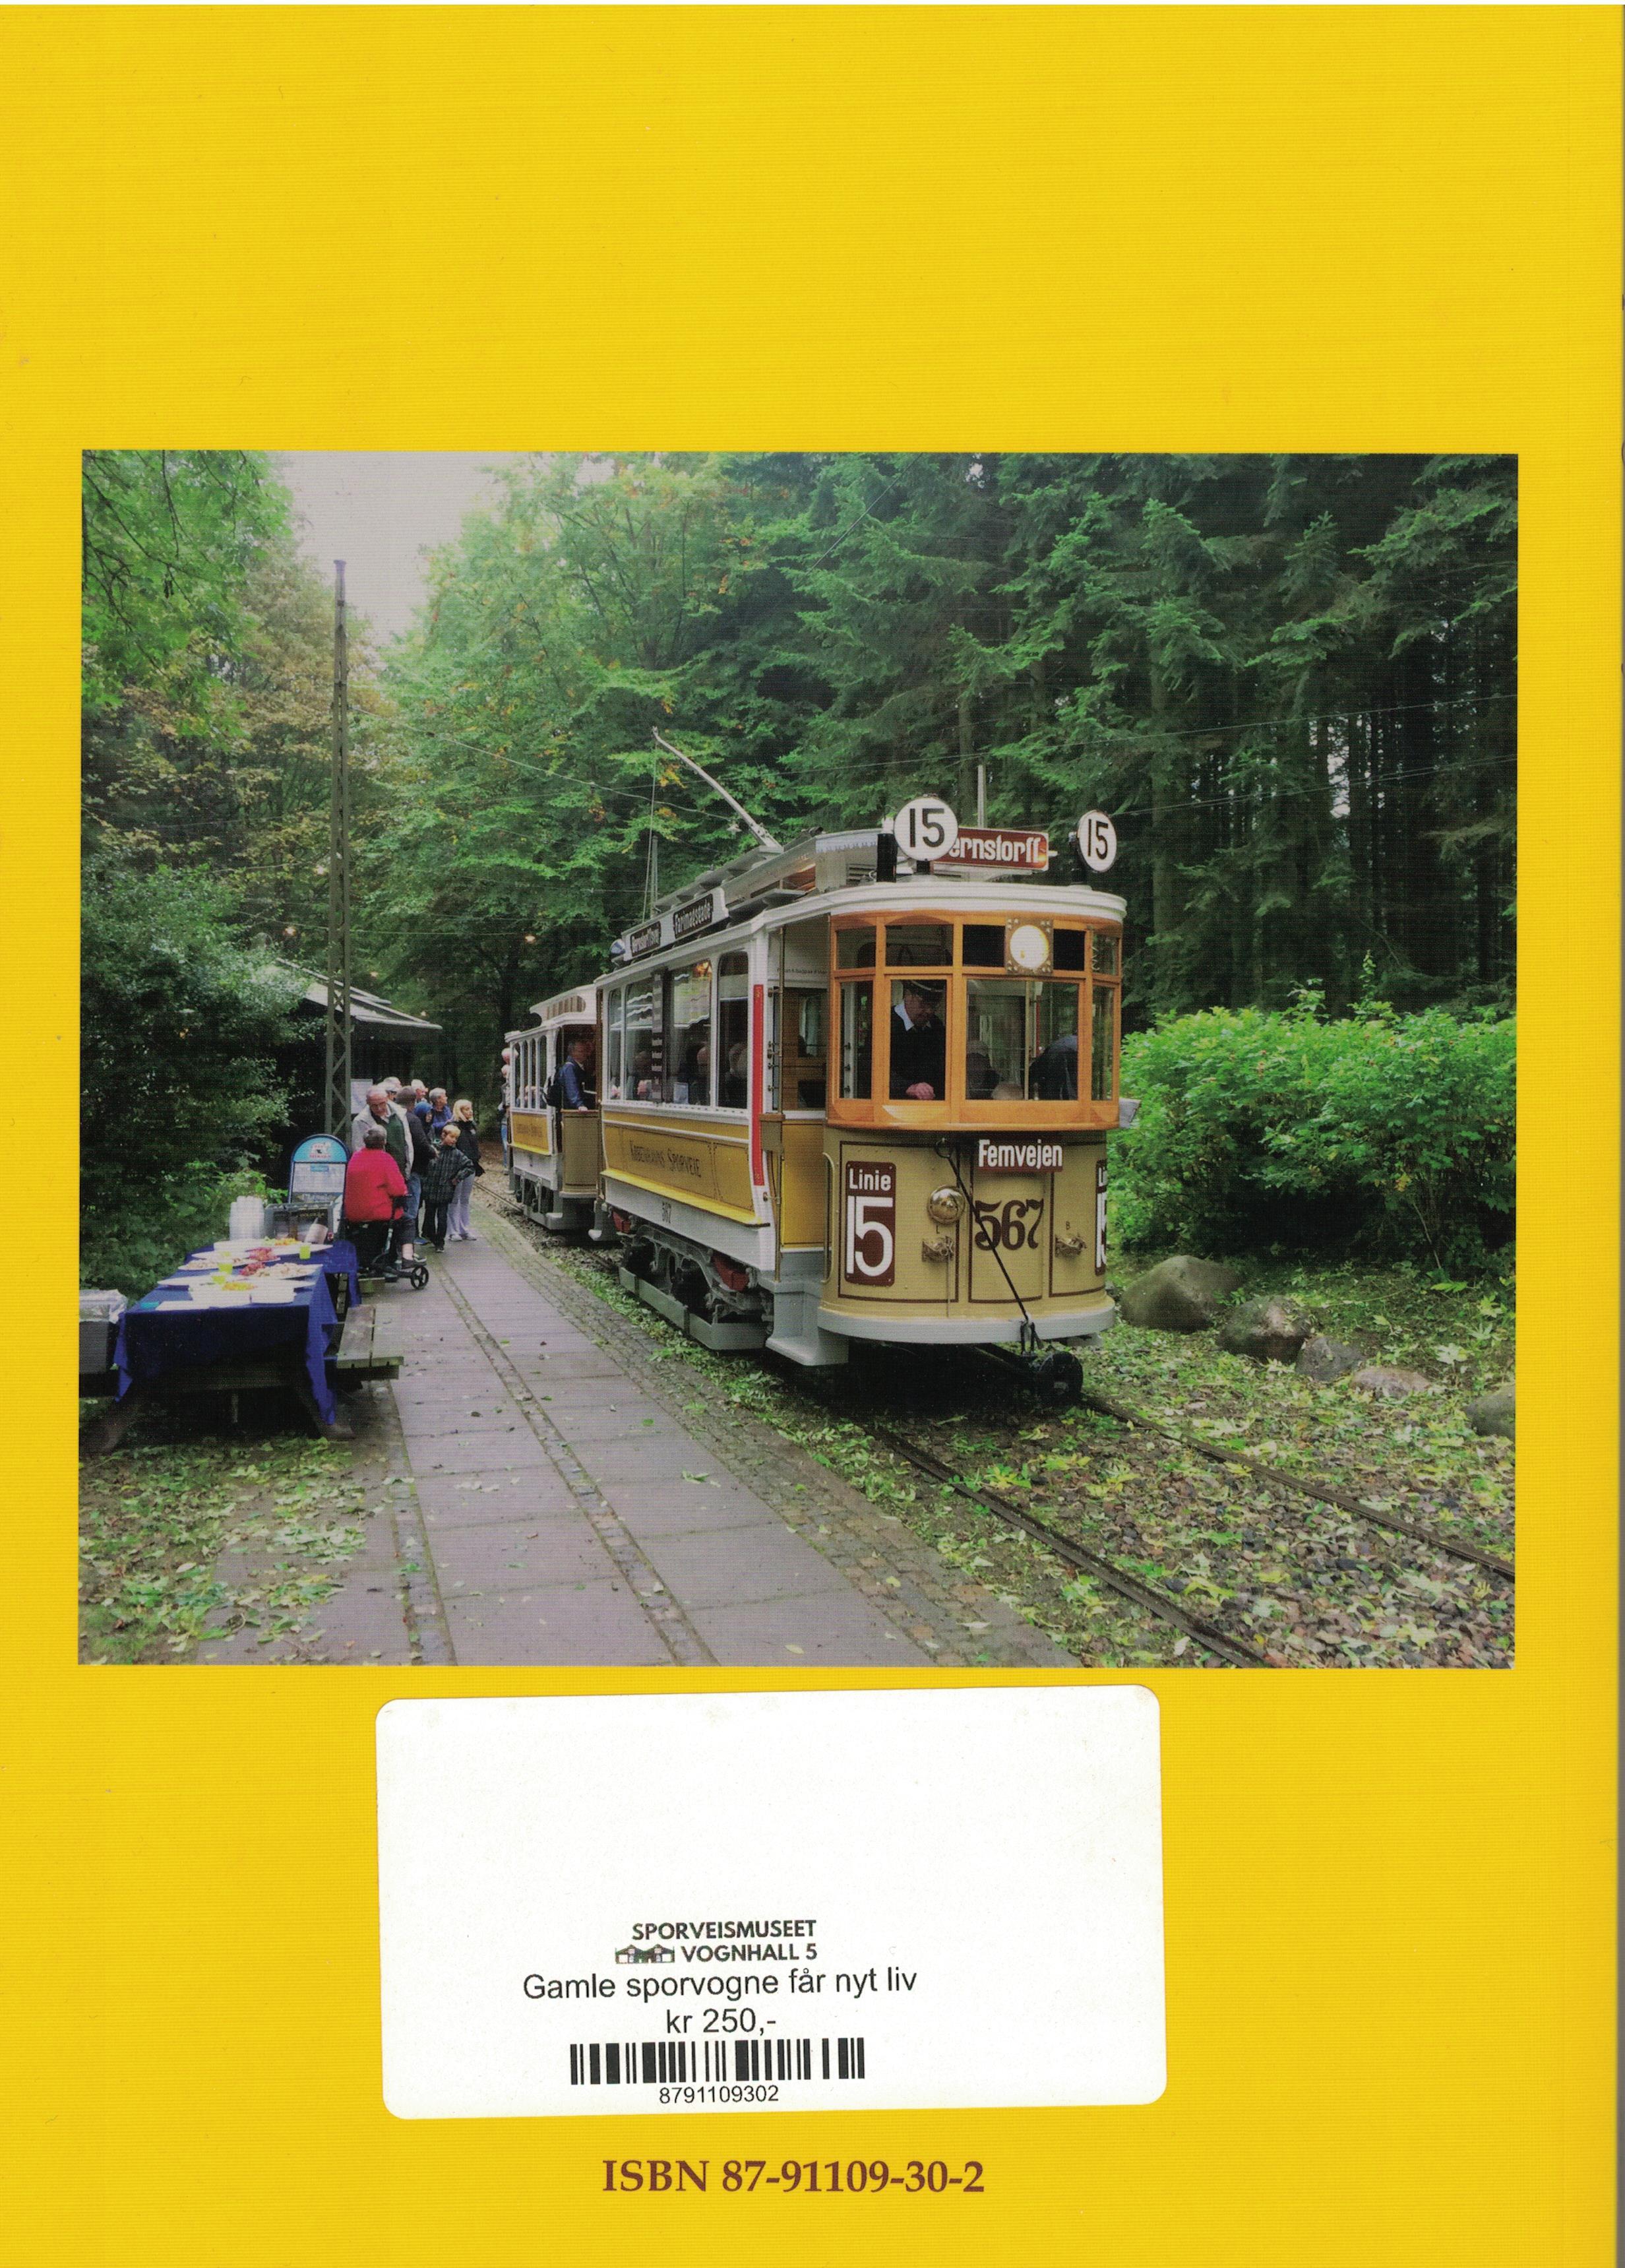 Gamle sporvogne får nyt liv